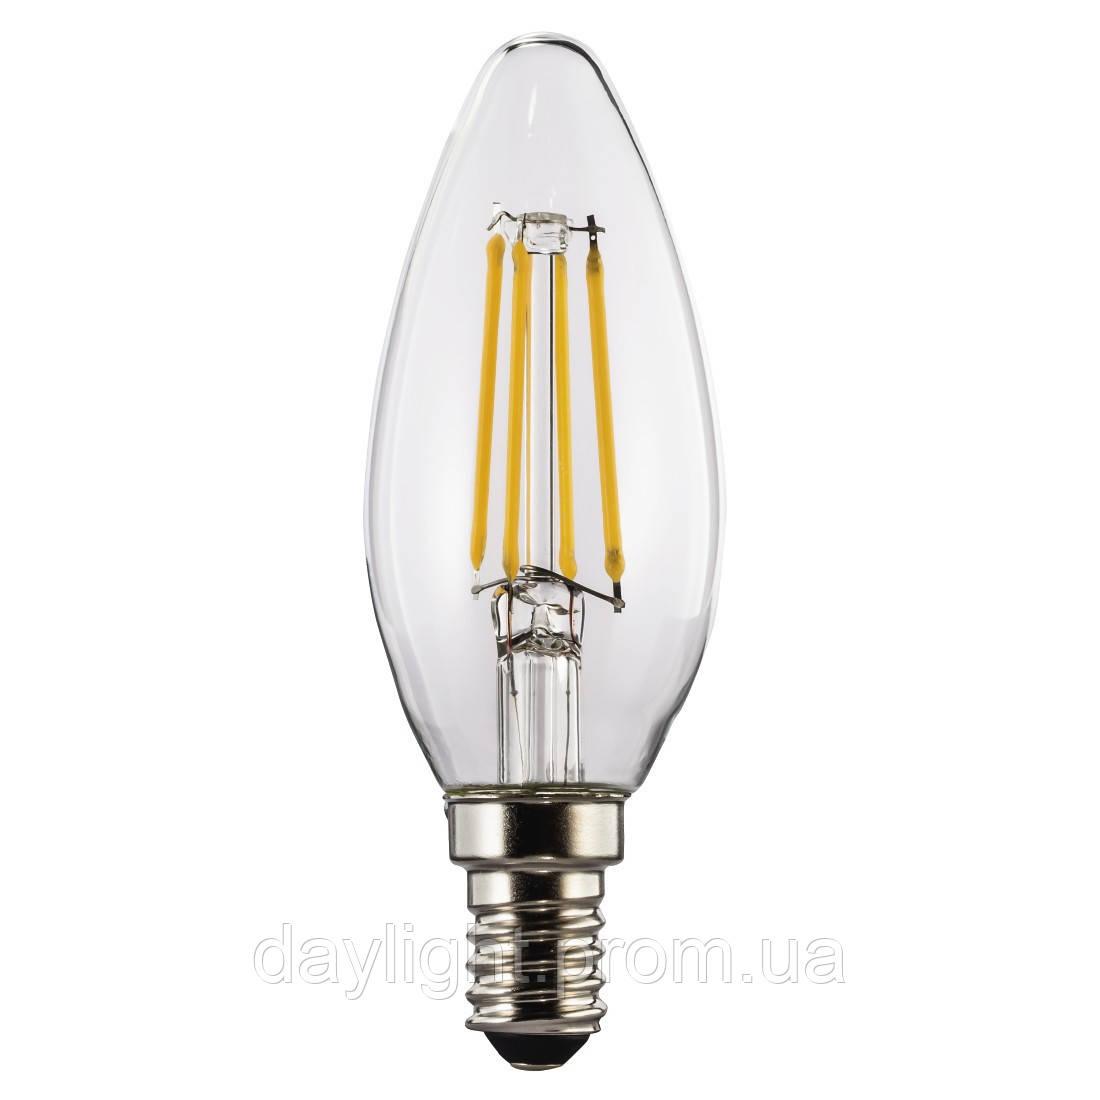 Лампа светодиодная филамент свеча 4W 2700k E14 Biom